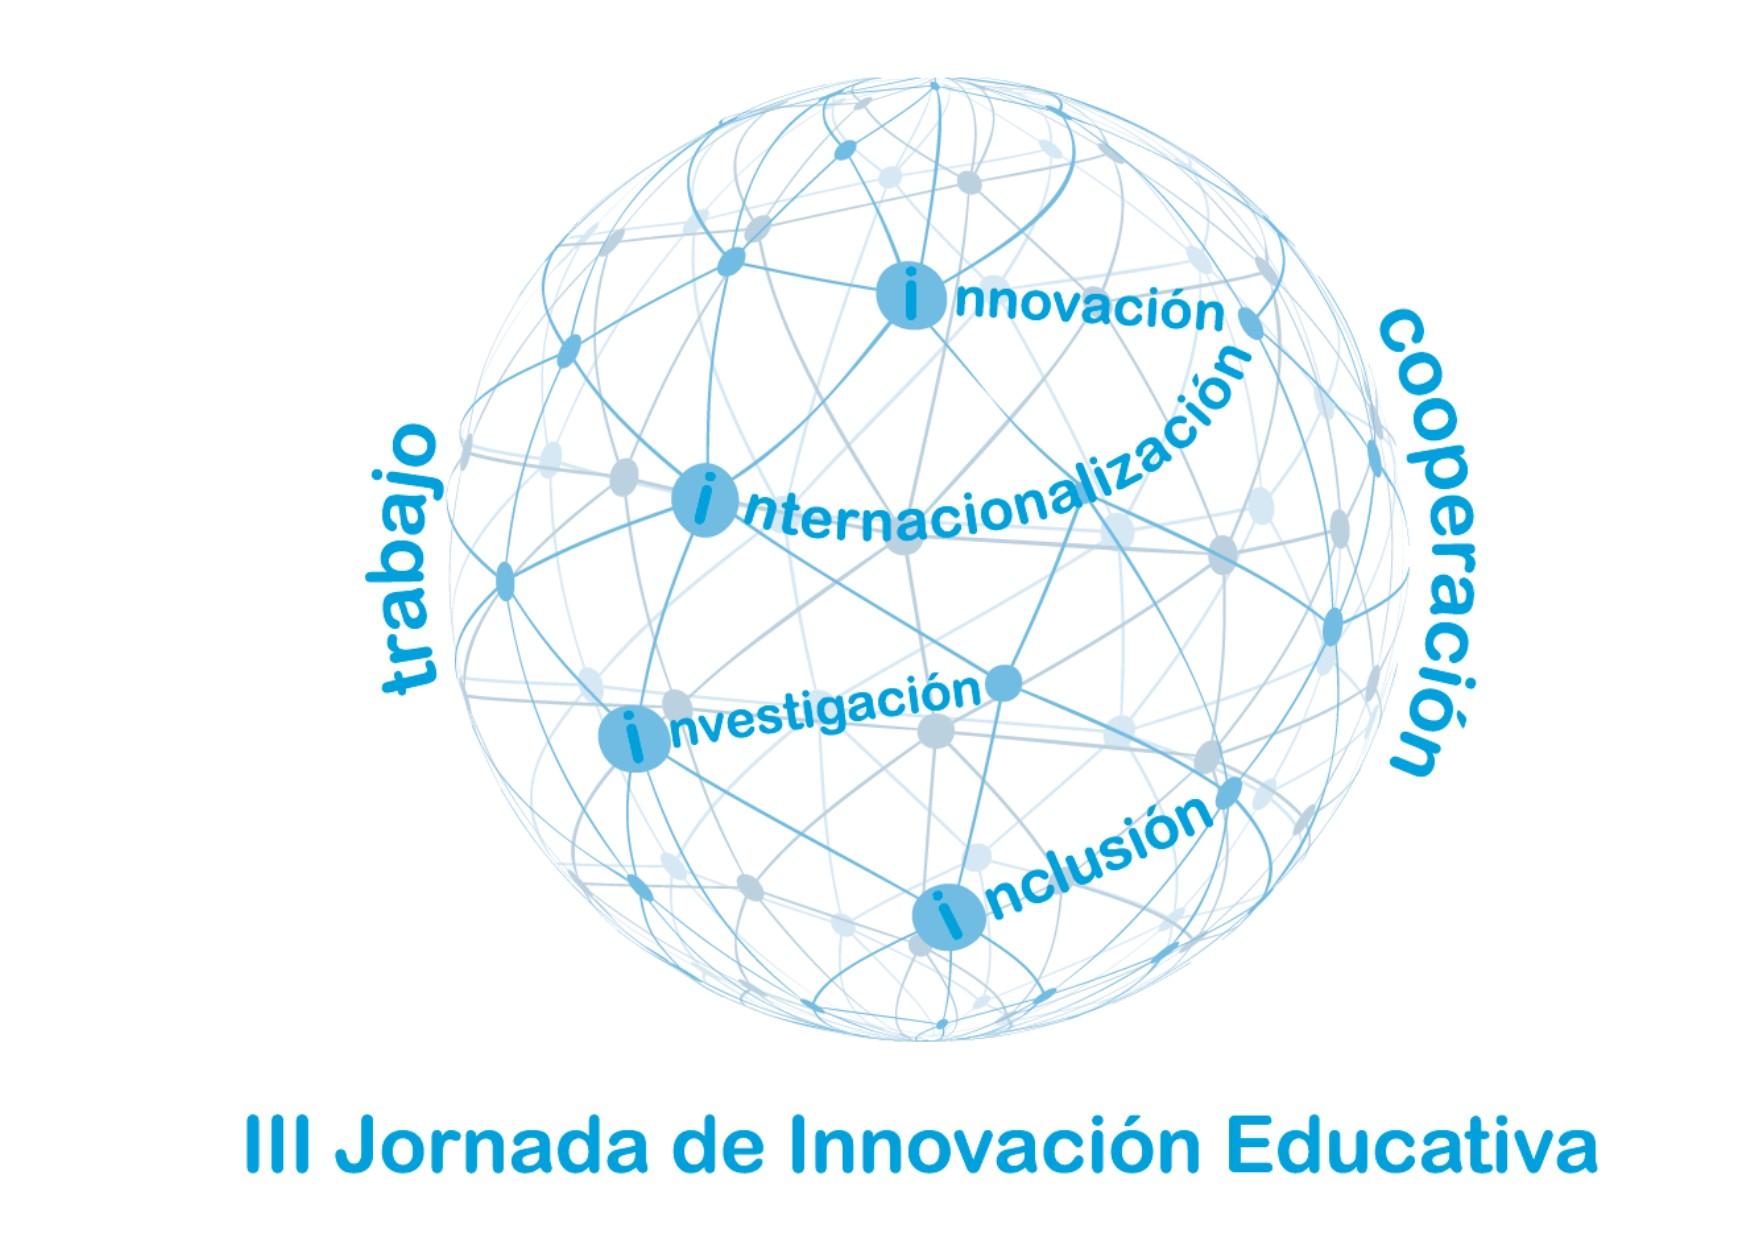 III Jornada de Innovación